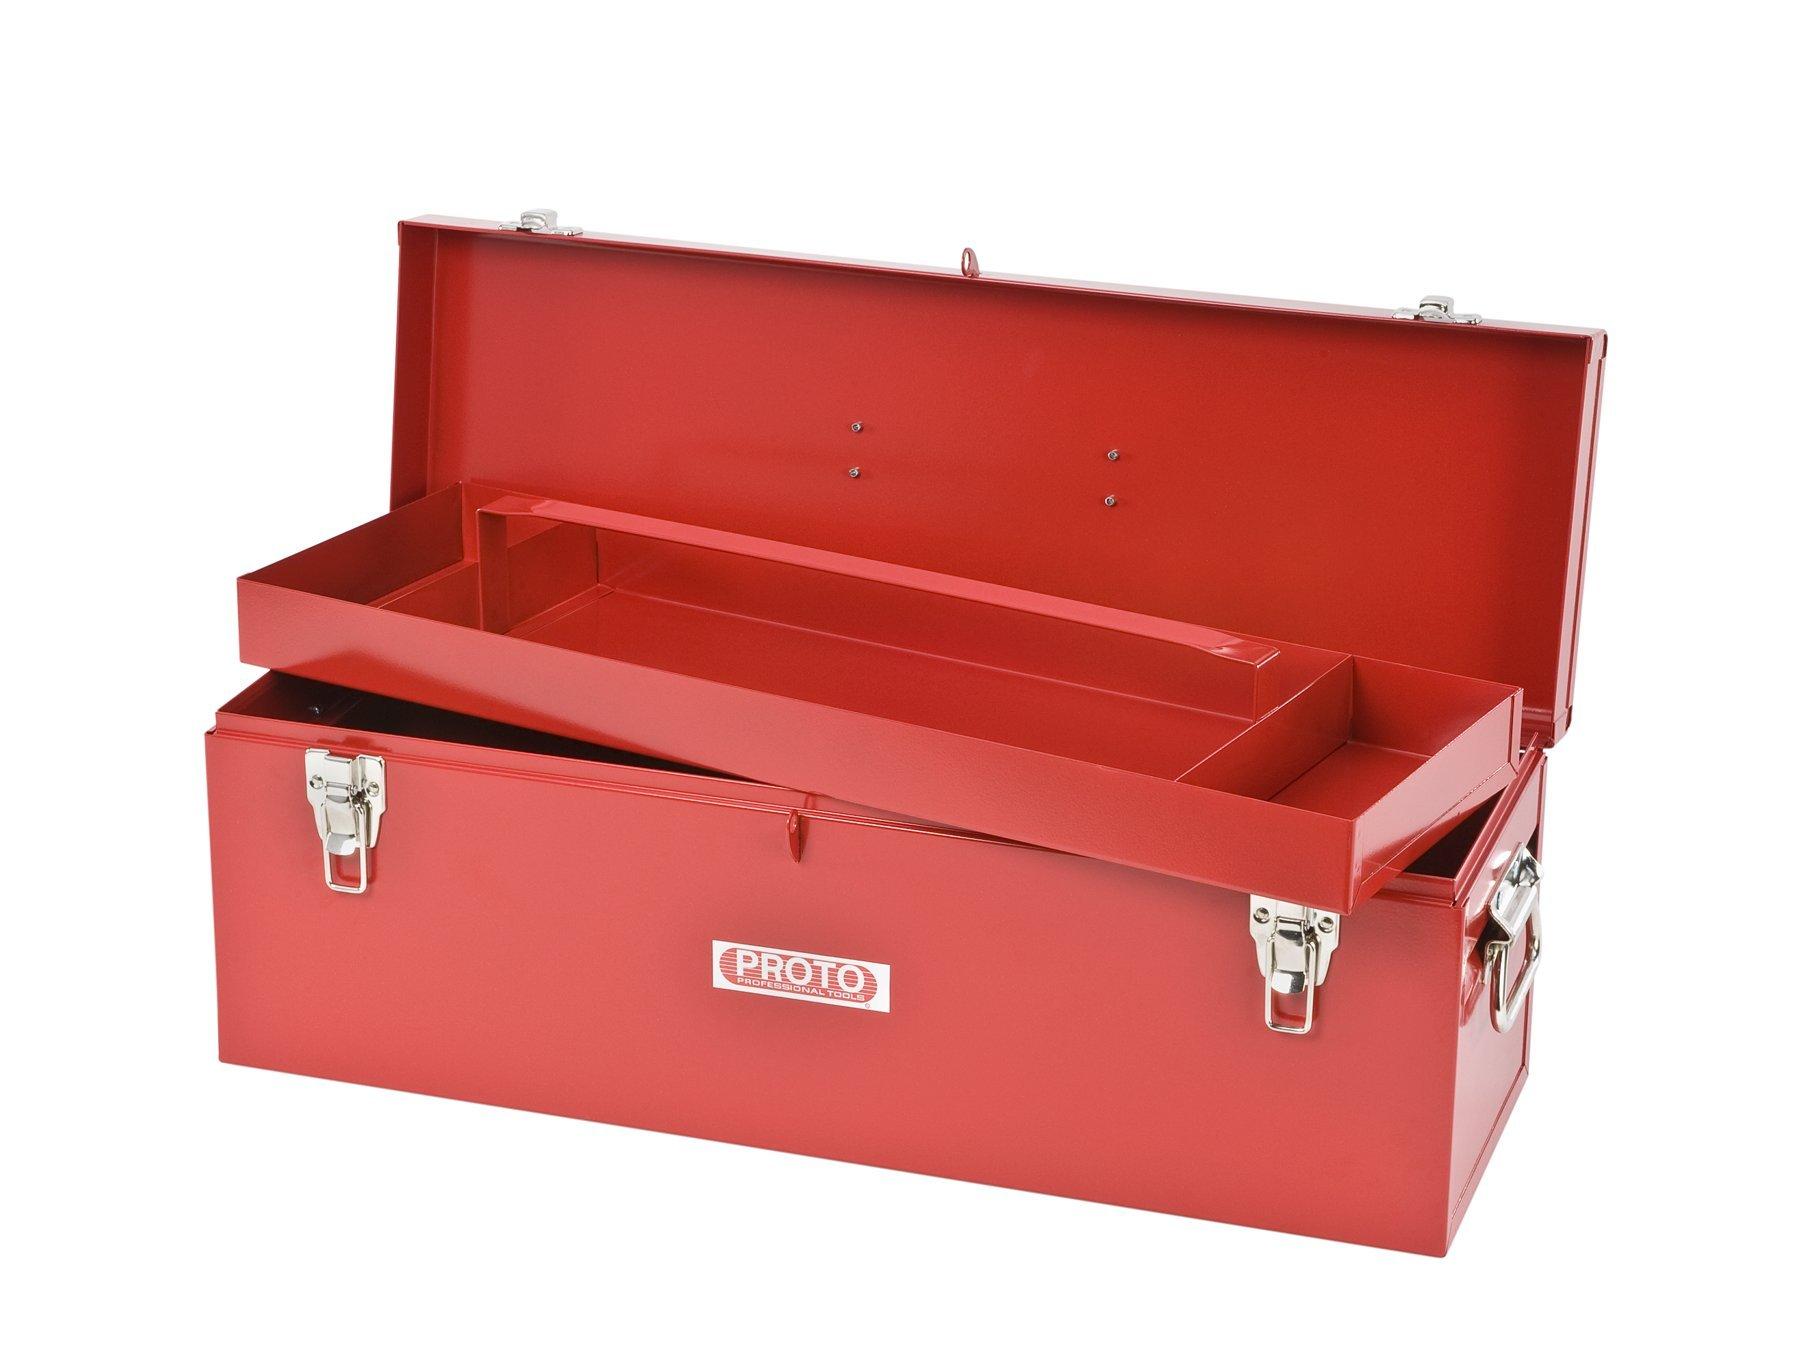 Stanley Proto J9977-NA Proto General Purpose Tool Box